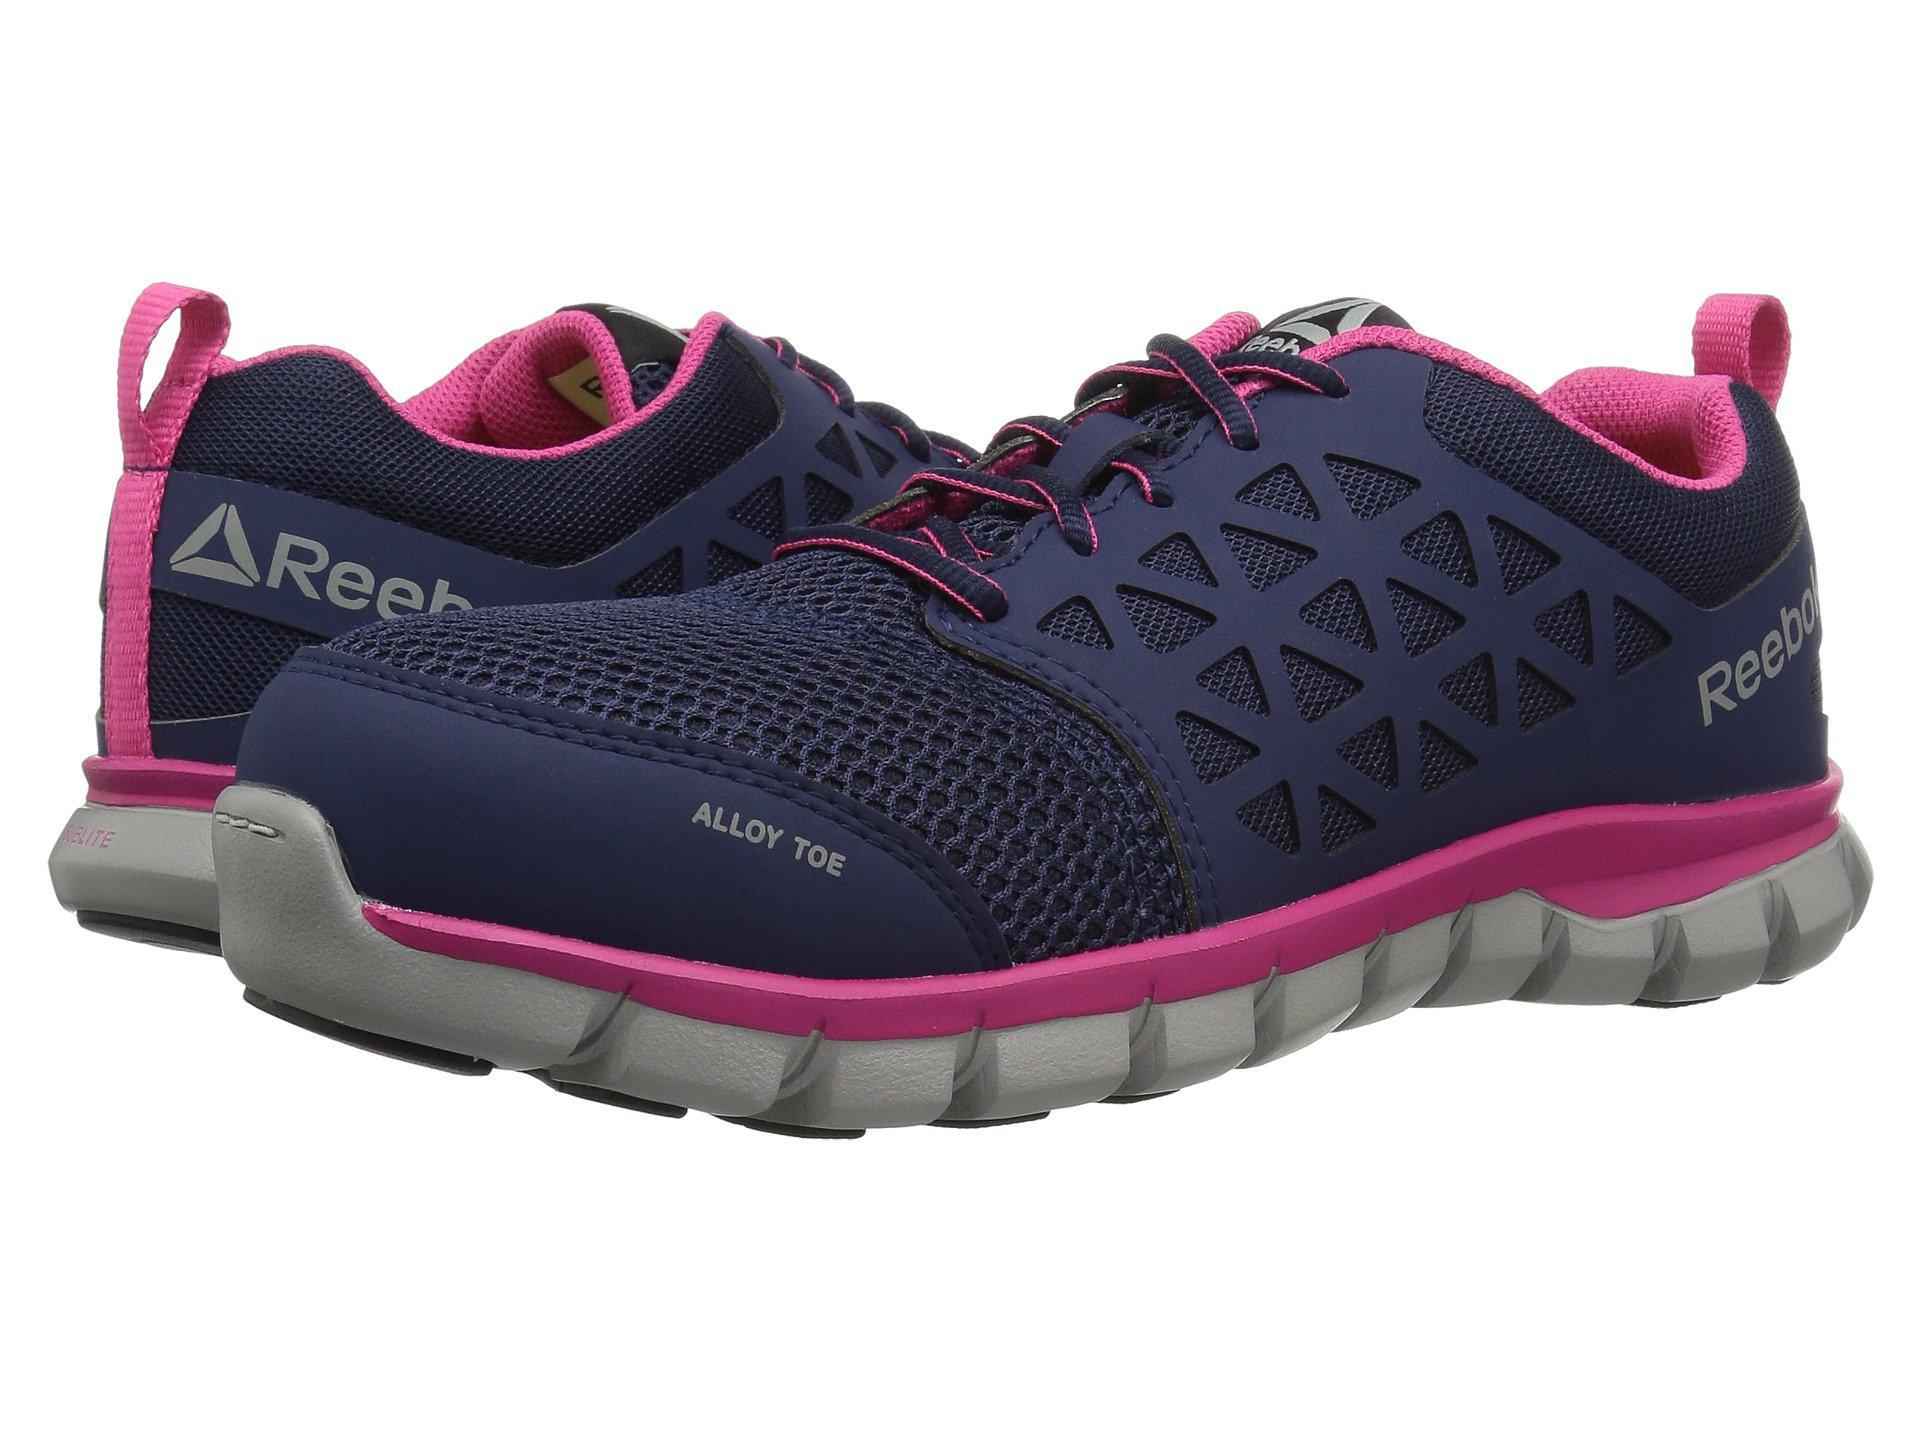 Lyst - Reebok Sublite Cushion Work (black 1) Women s Work Boots in Blue 8b1045178